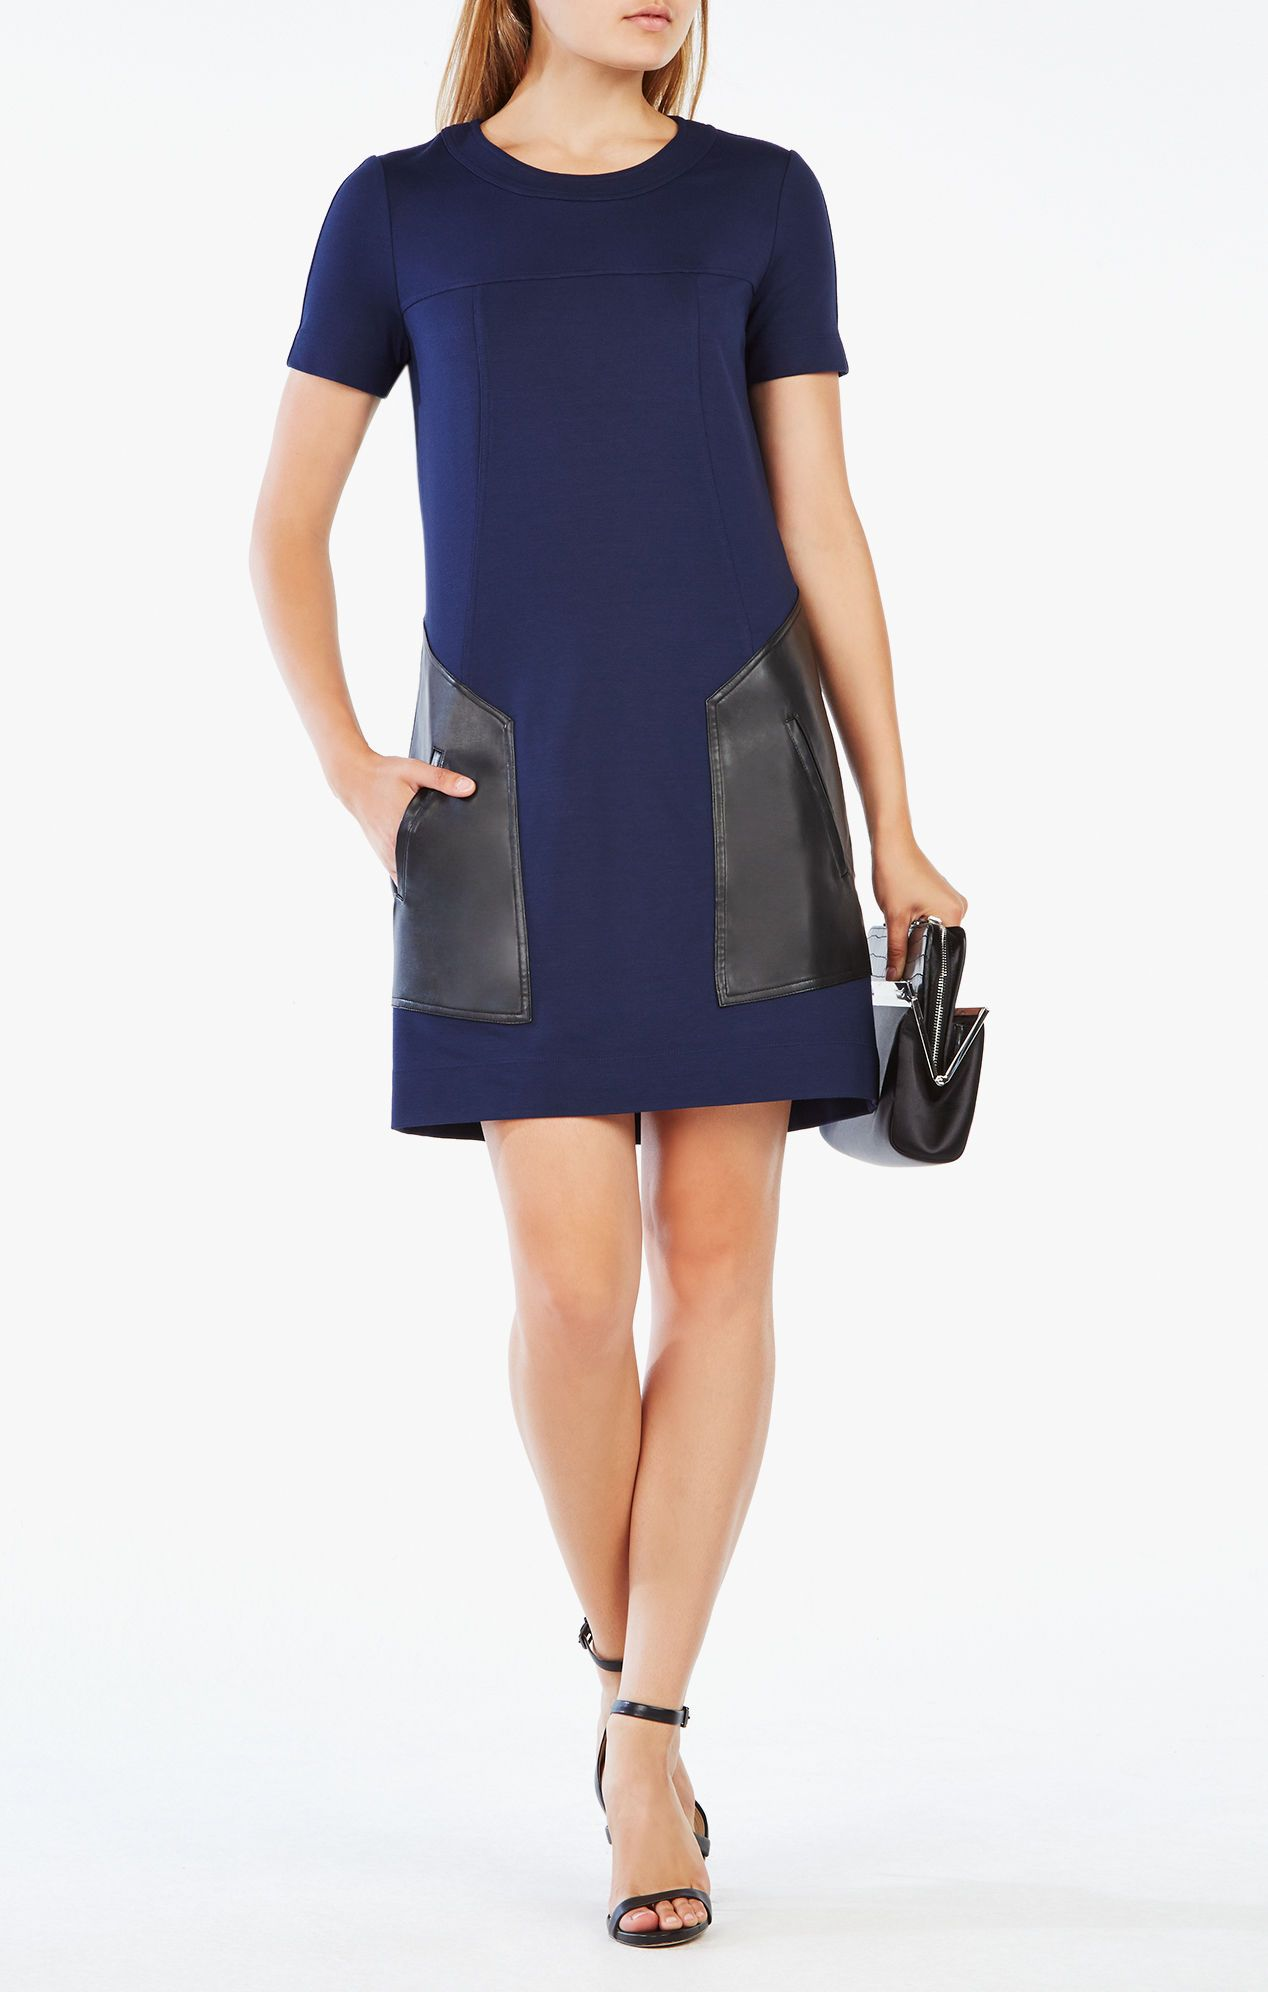 0a36195900cb Chrissie Pleather-Blocked Dress, BCBG Max Azria, $148 | Fashion Wish ...